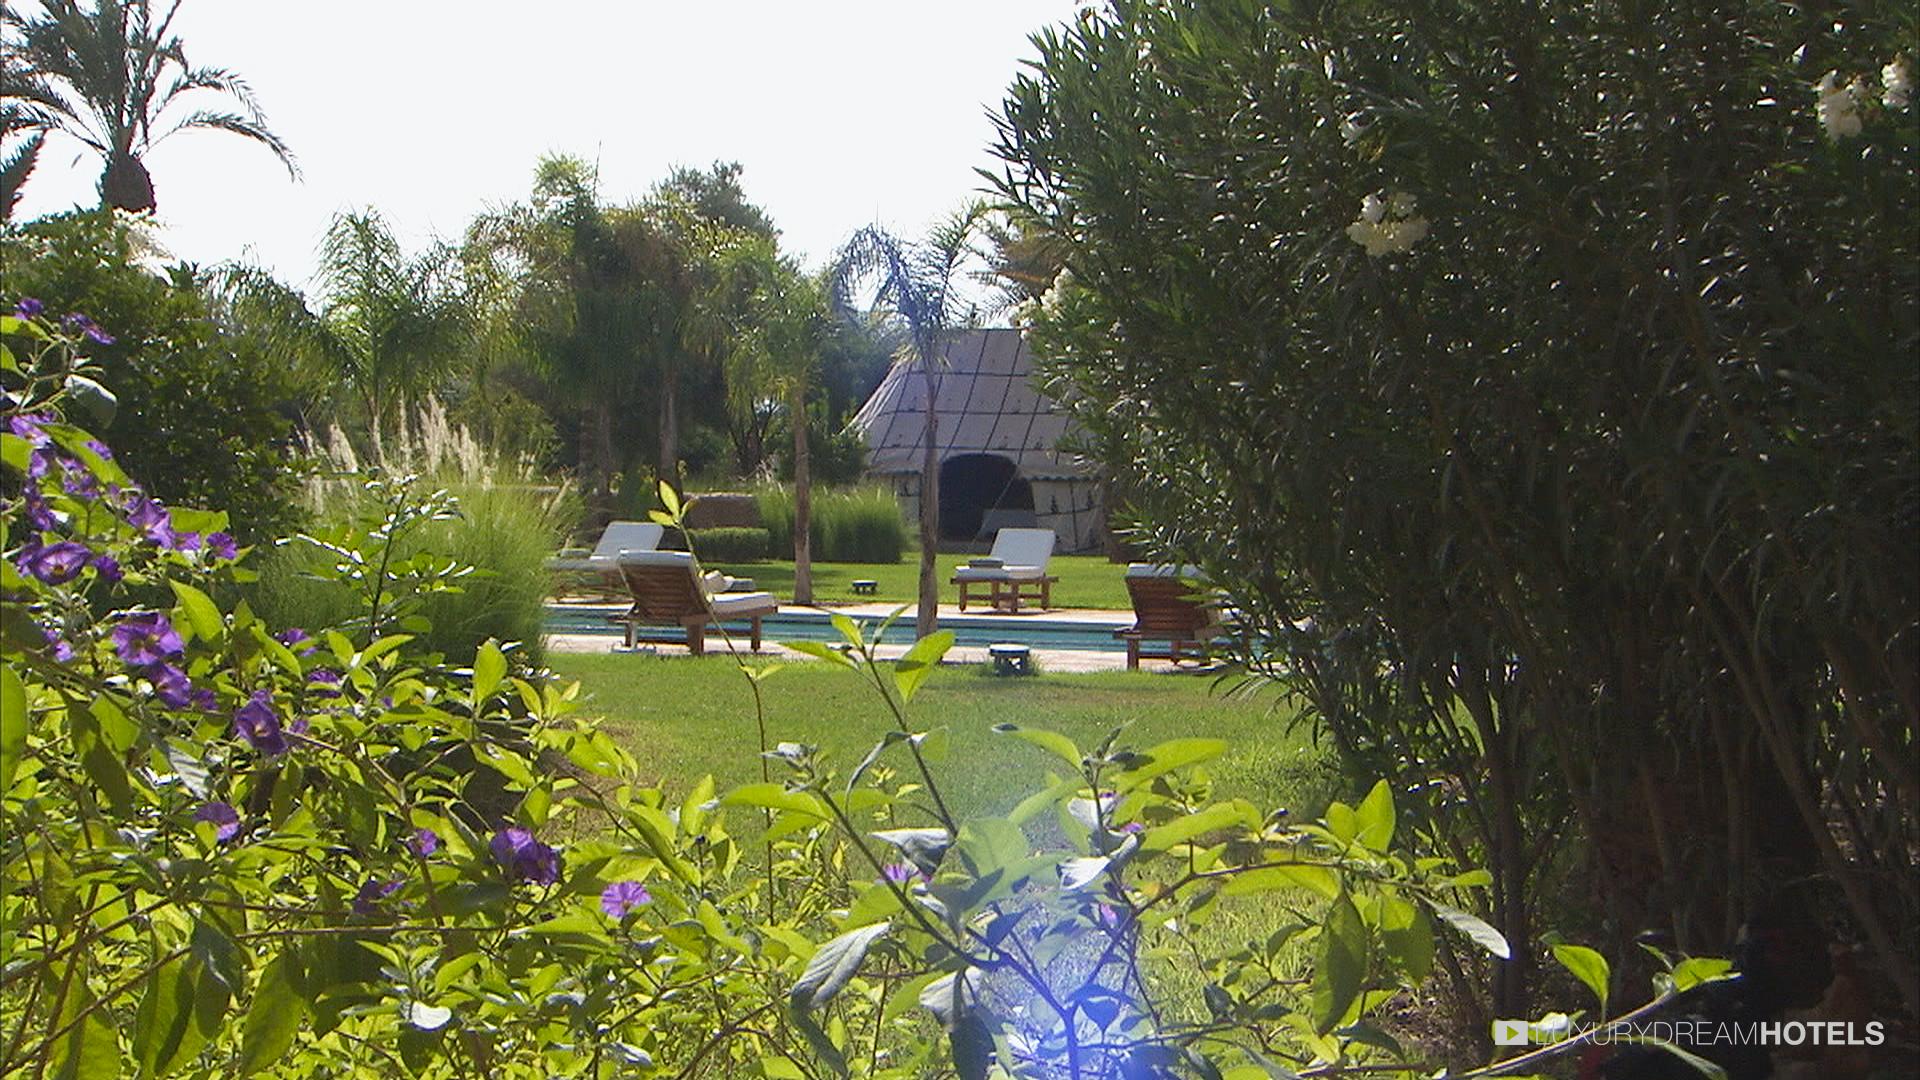 Luxury hotel Villa Jardin Nomade Marrackech Morocco Luxury